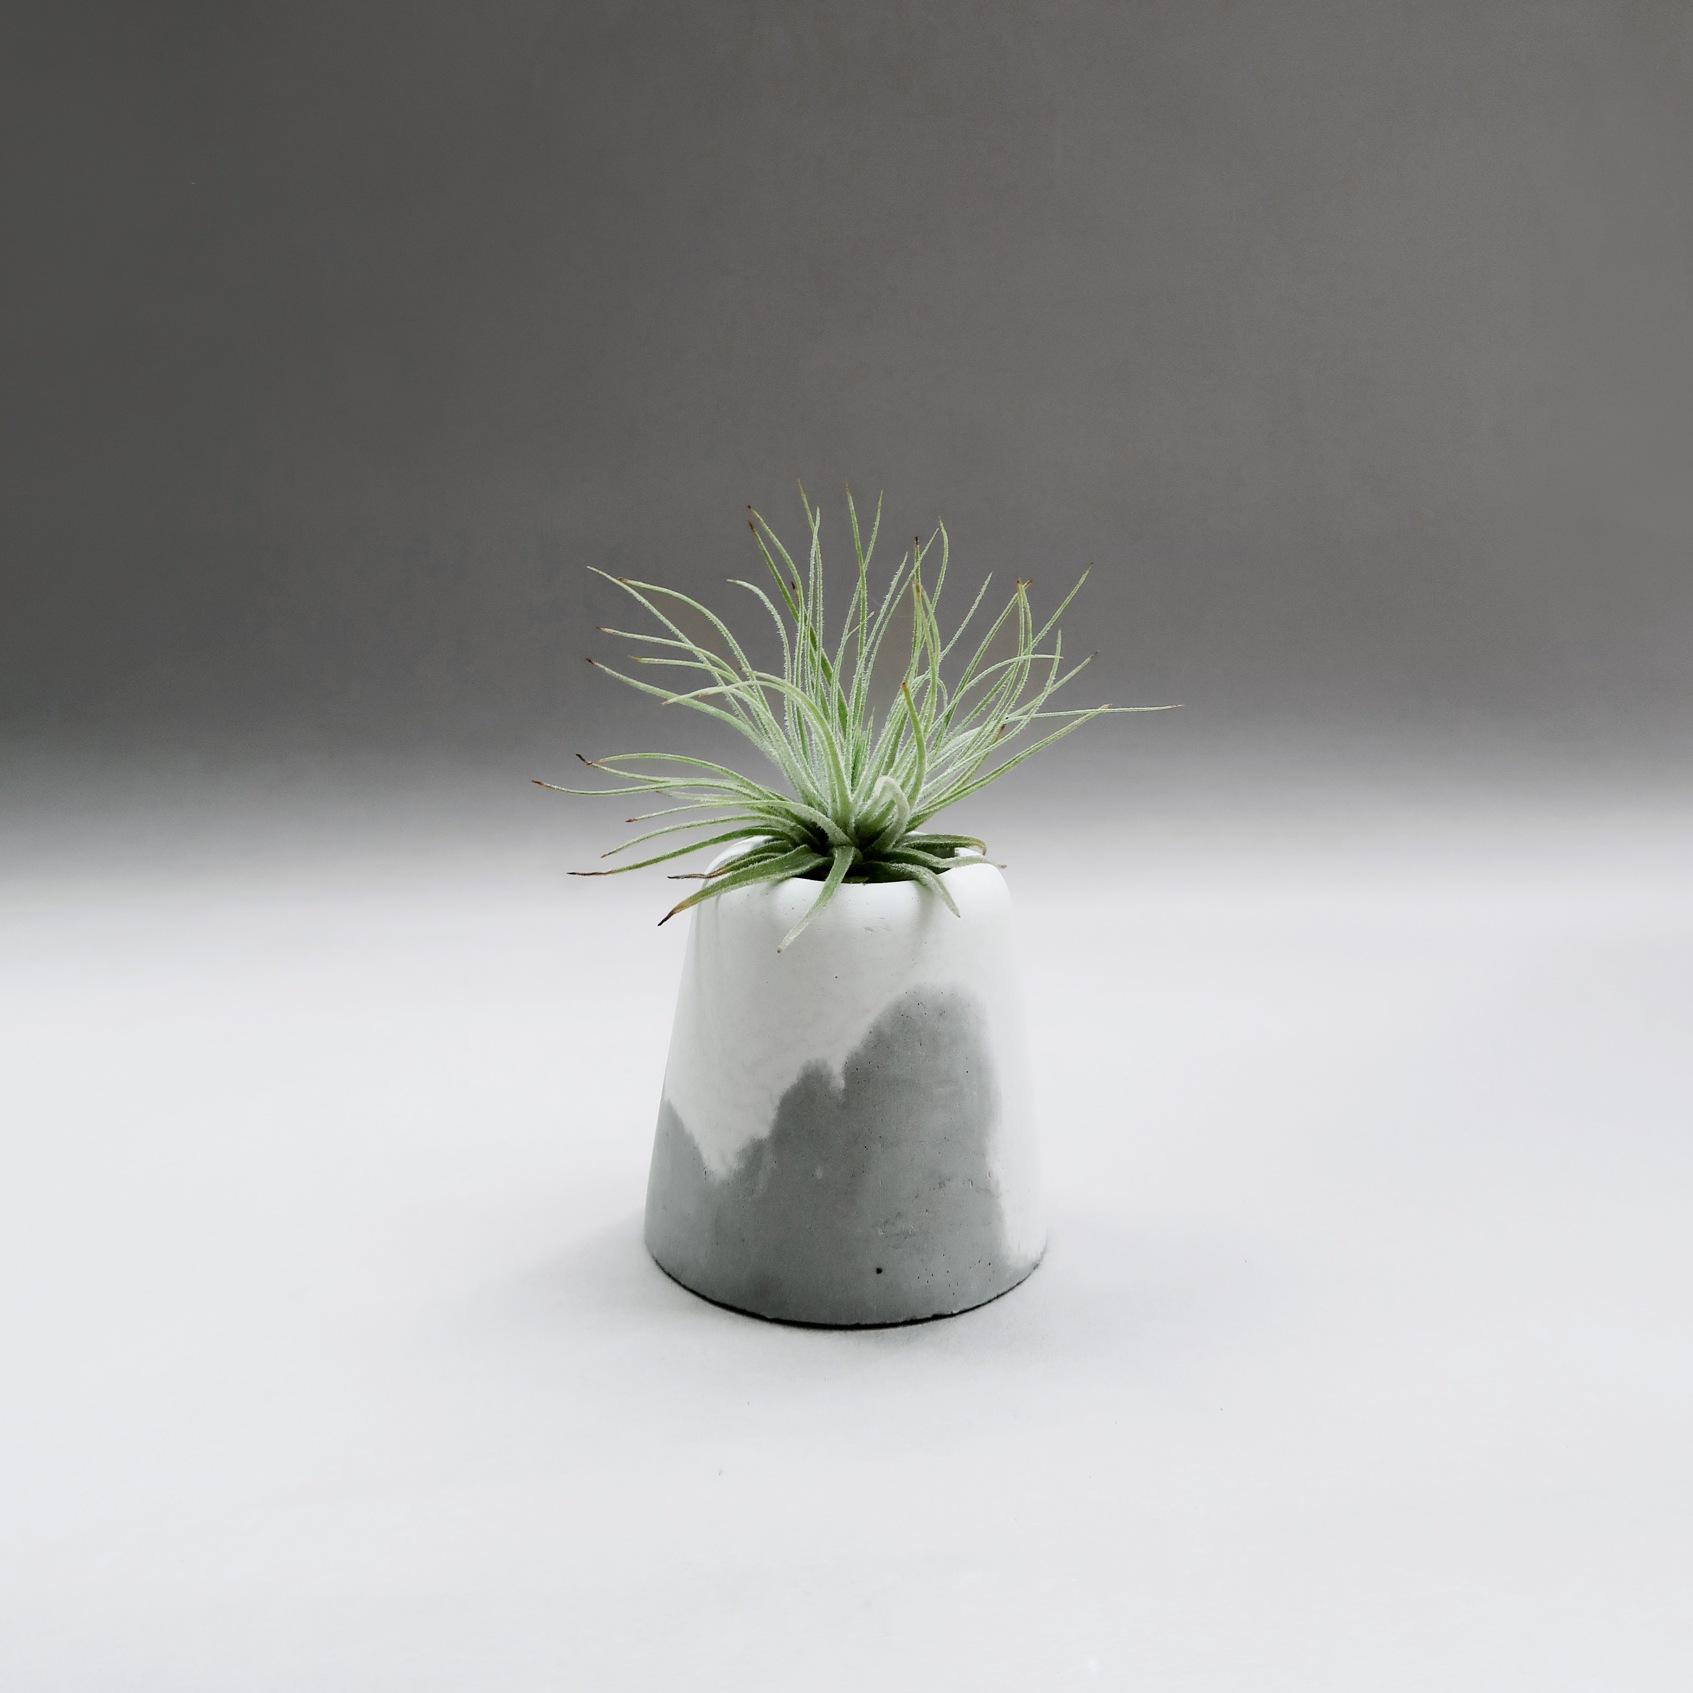 SNOW VOLCAN 小雪火山水泥設計盆器・家飾・禮物